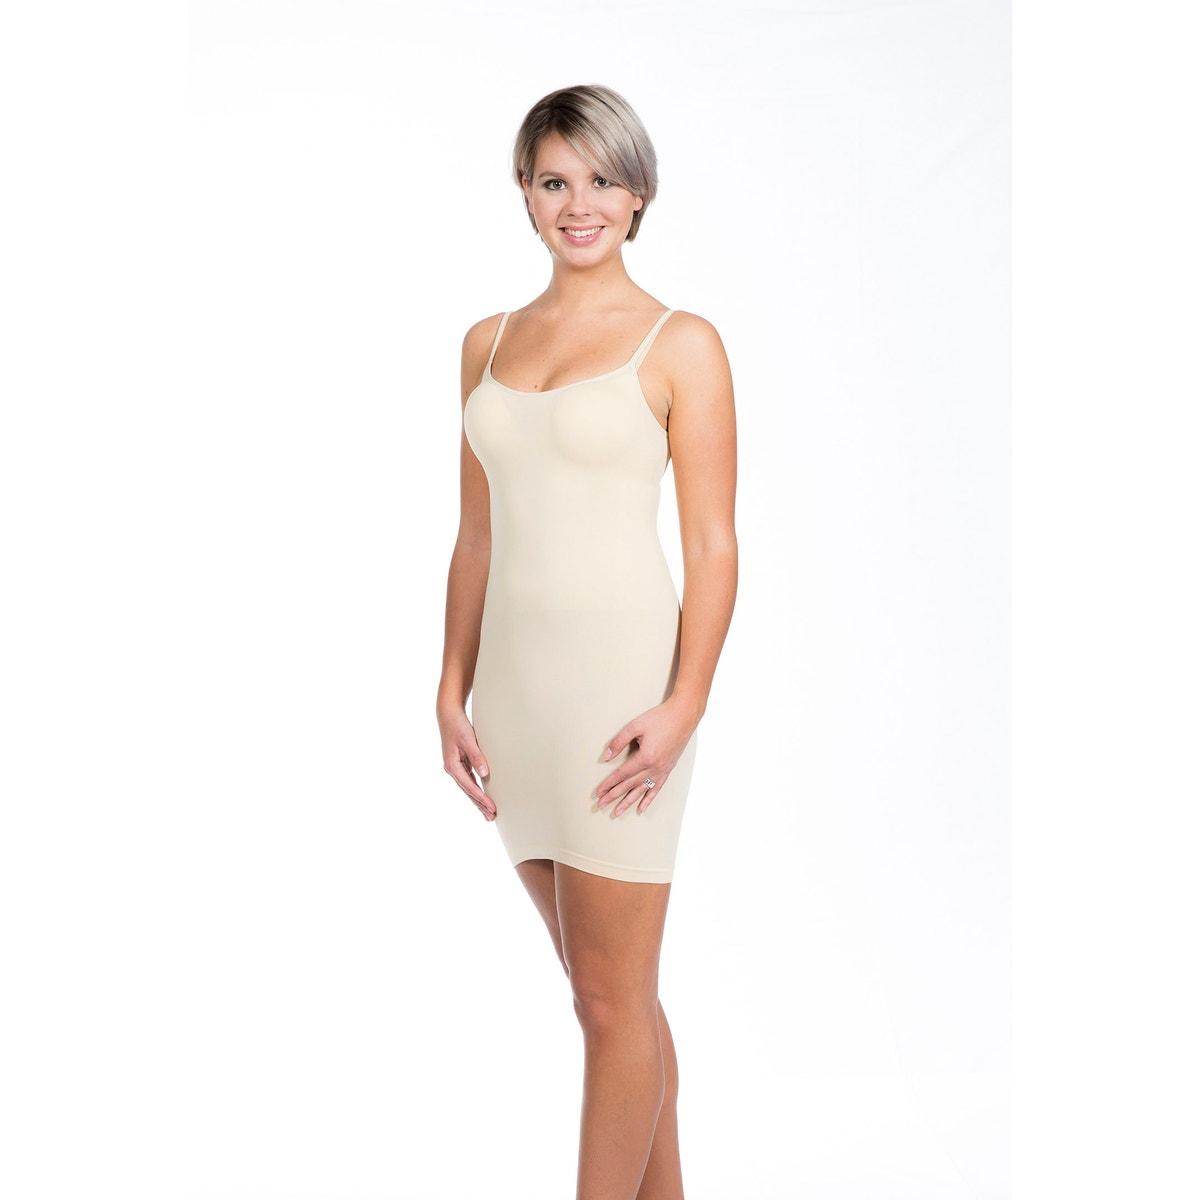 a85973c8ee05 LaRedoute Φόρεμα σμίλευσης Seamless Bodydress